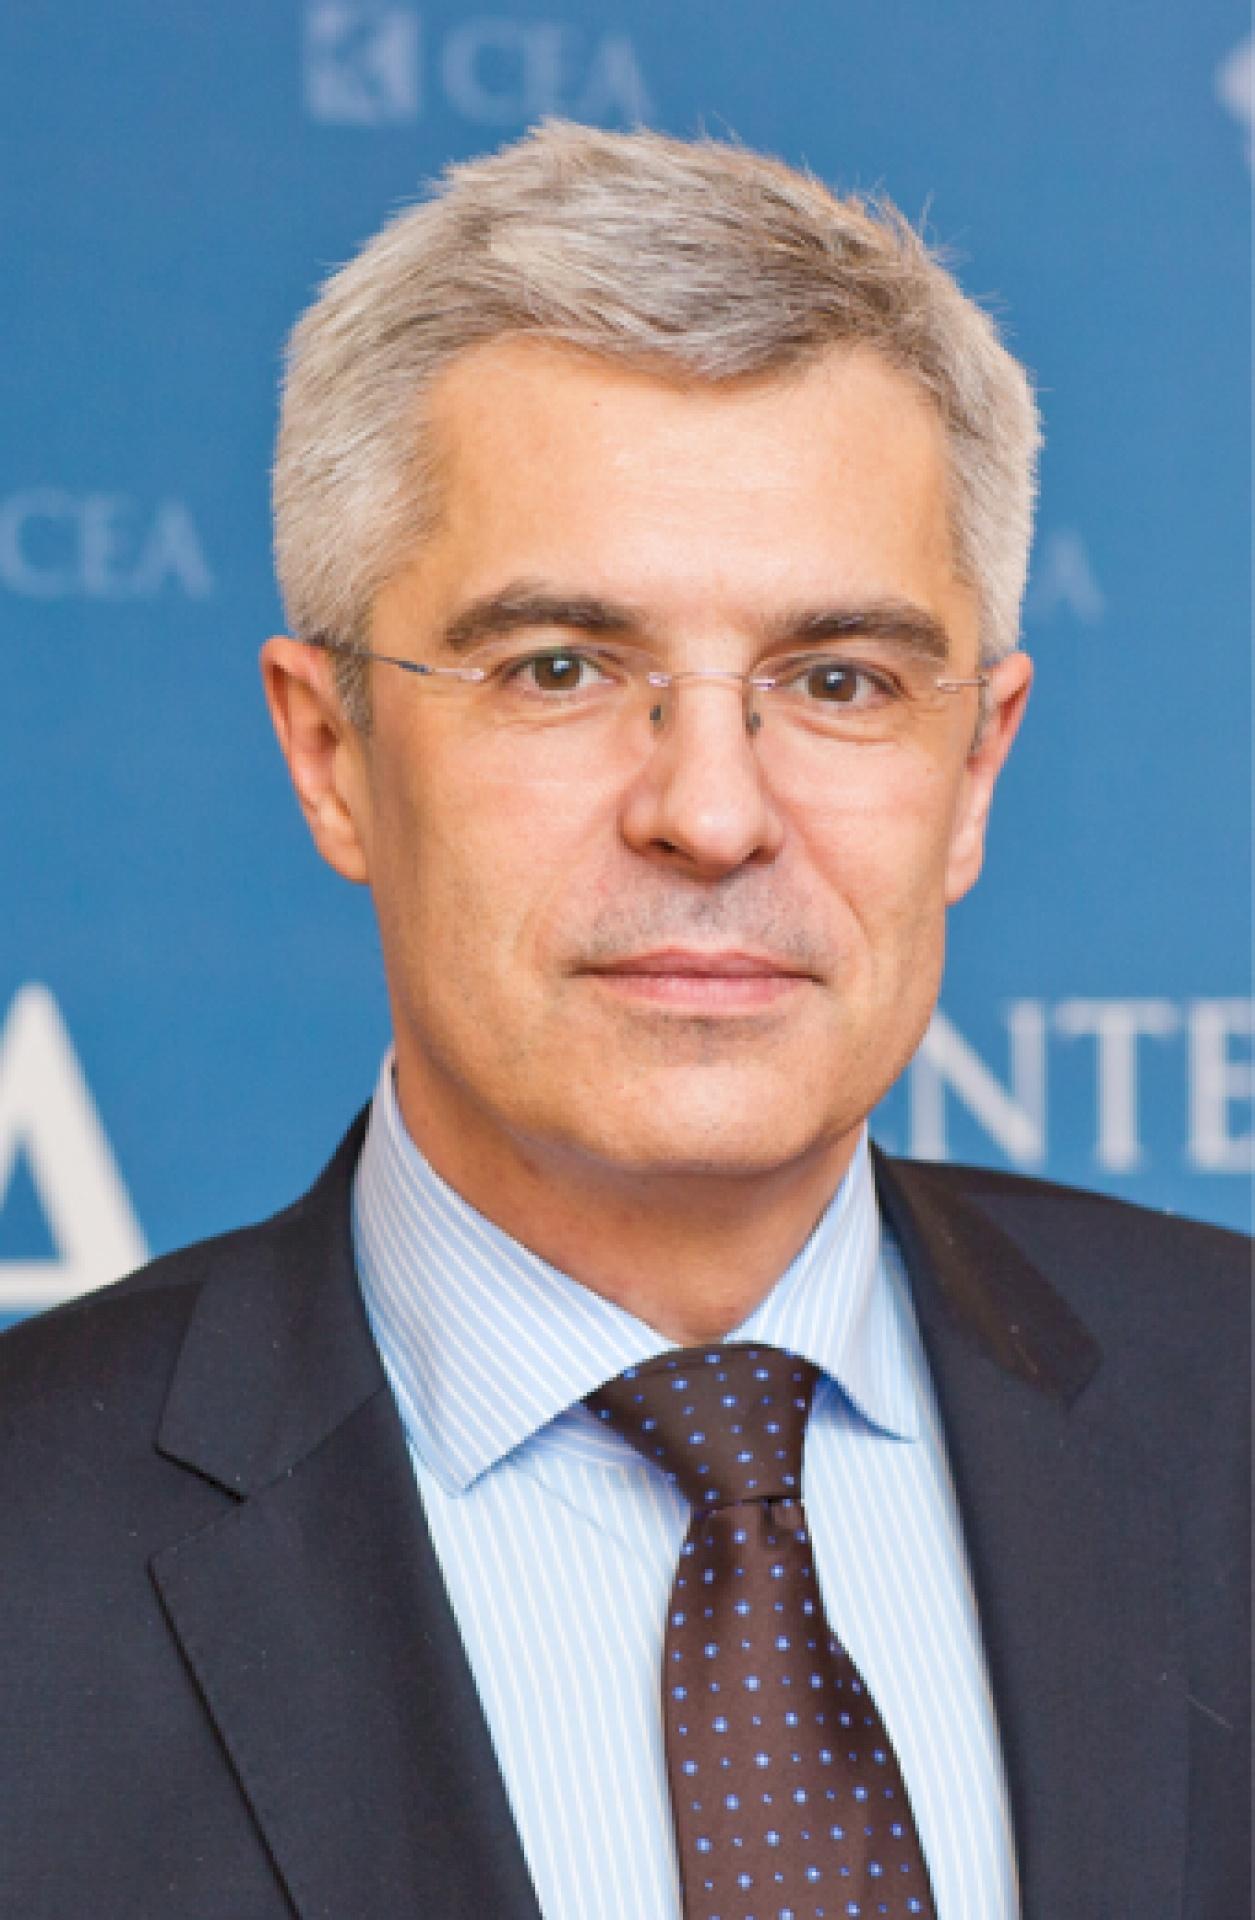 H.E. Ivan Korčok